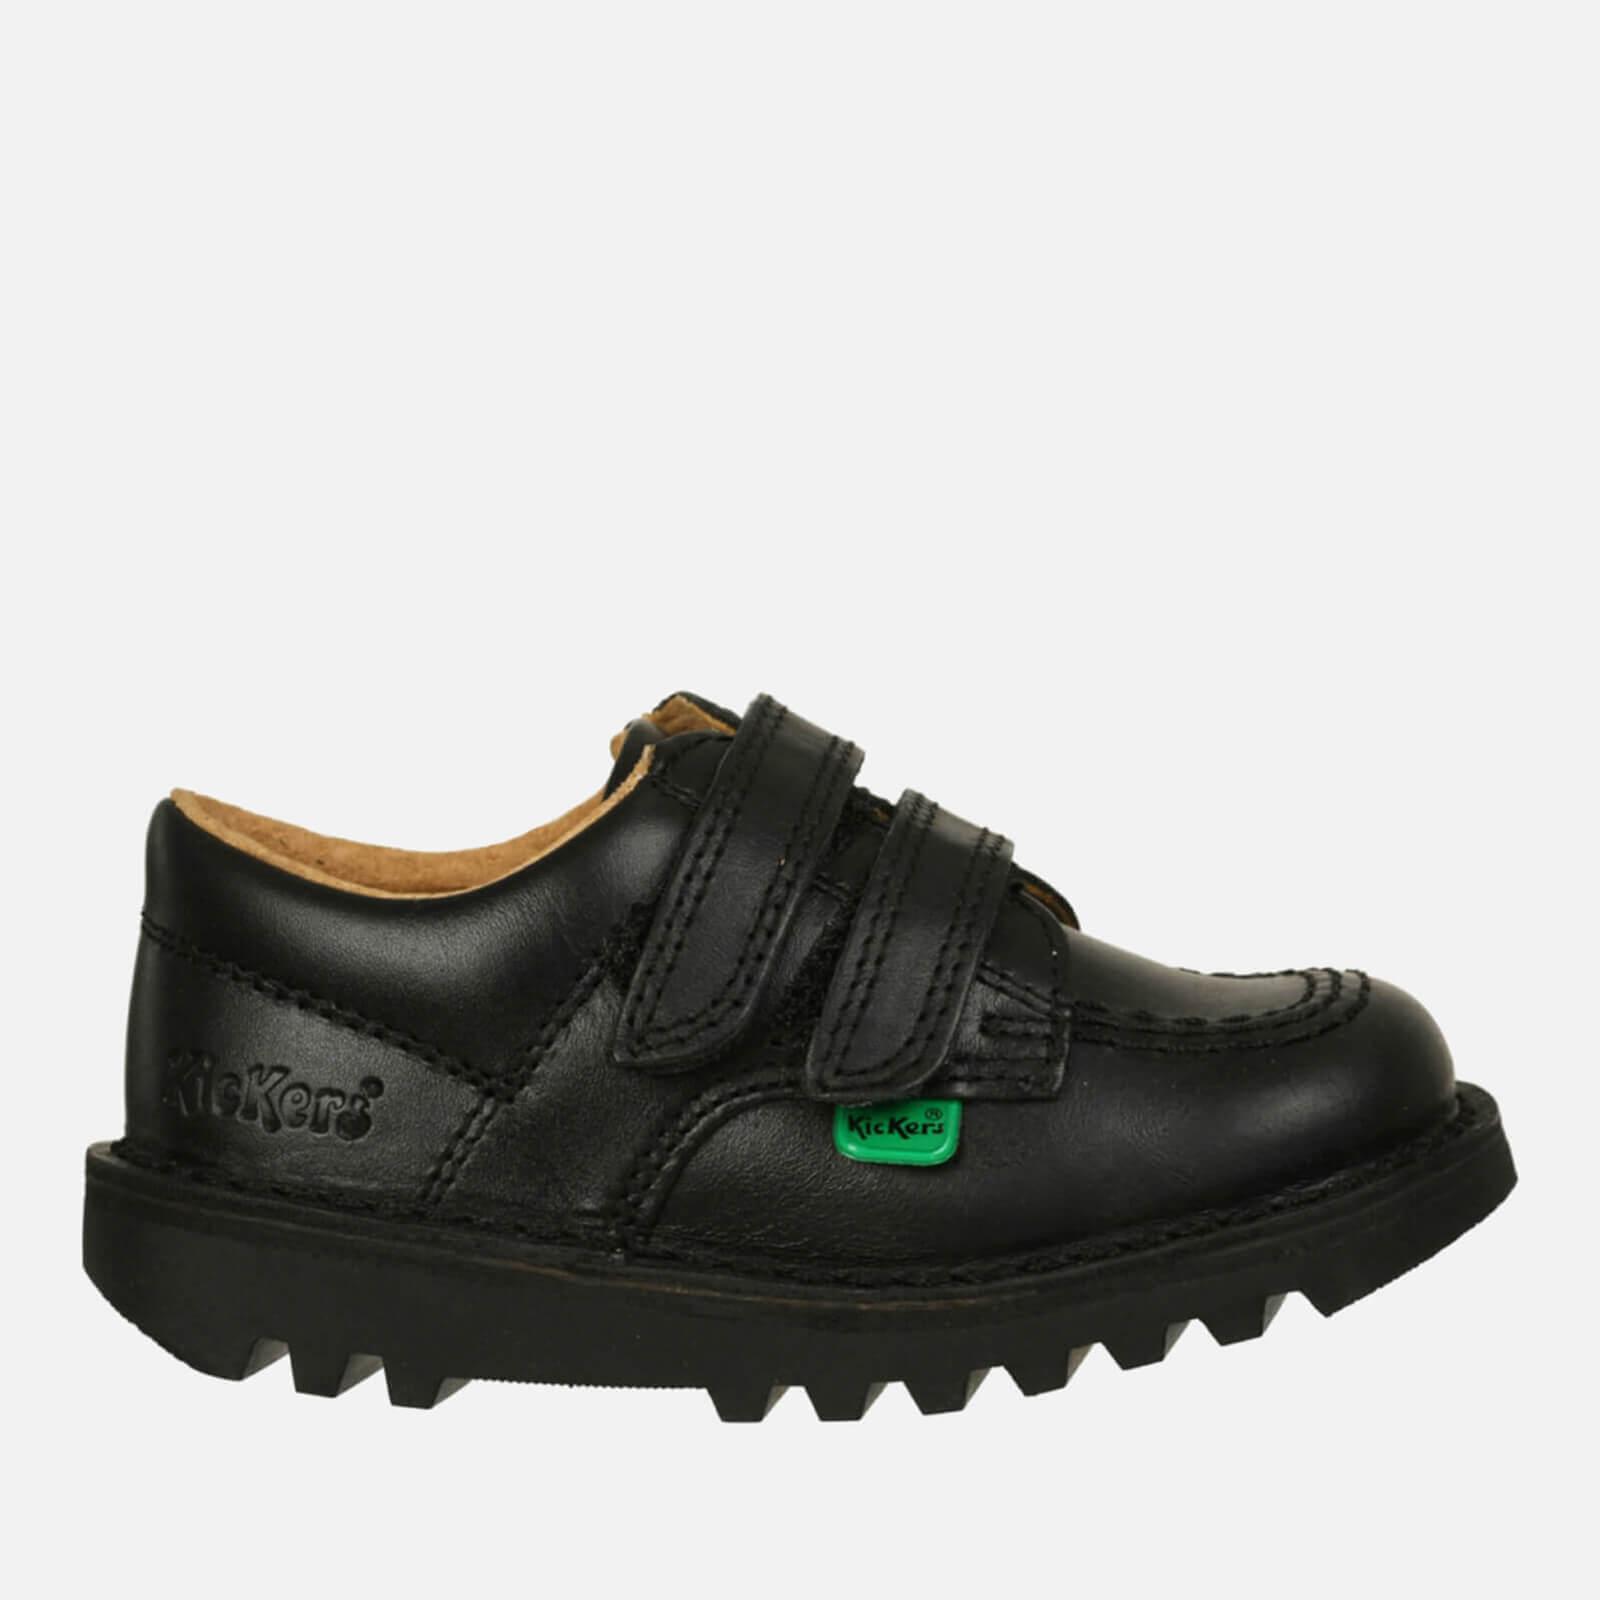 Kickers Kids' Kick Lo Velcro Strap Shoes - Black - UK 6 Infant/EU 23 - Black